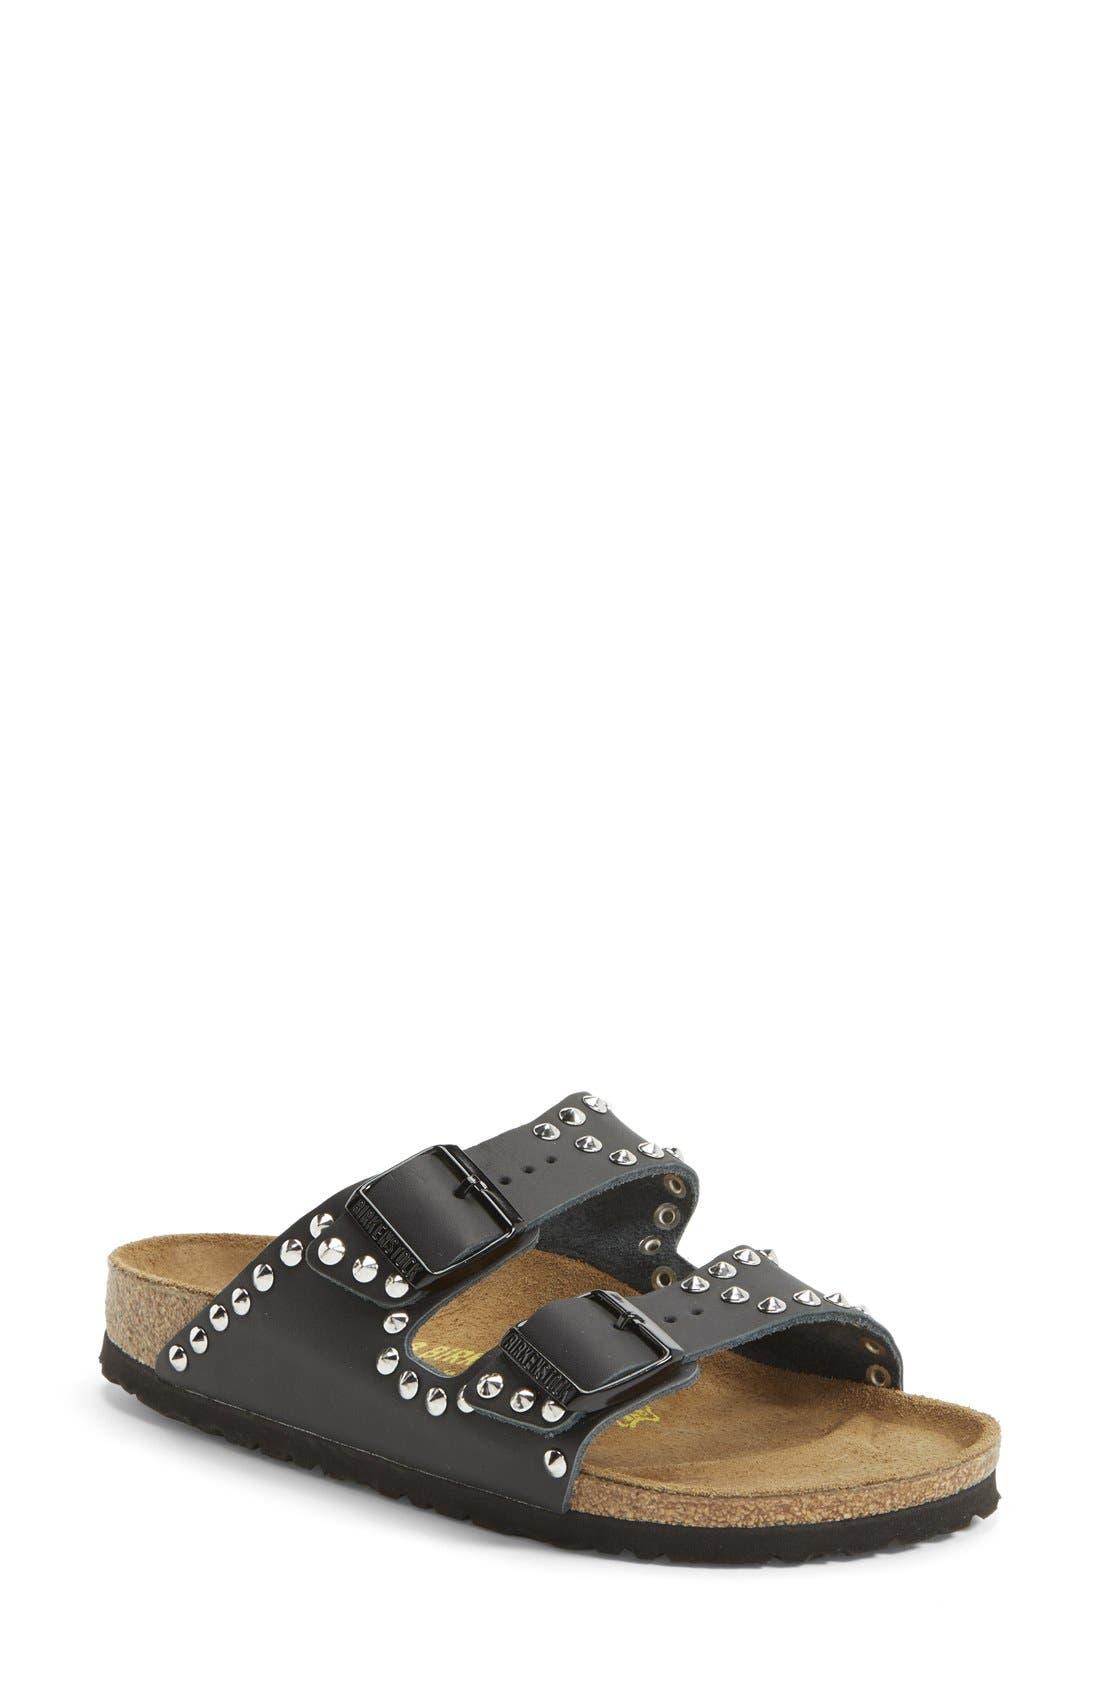 BIRKENSTOCK 'Arizona' Studded Leather Sandal, Main, color, 001